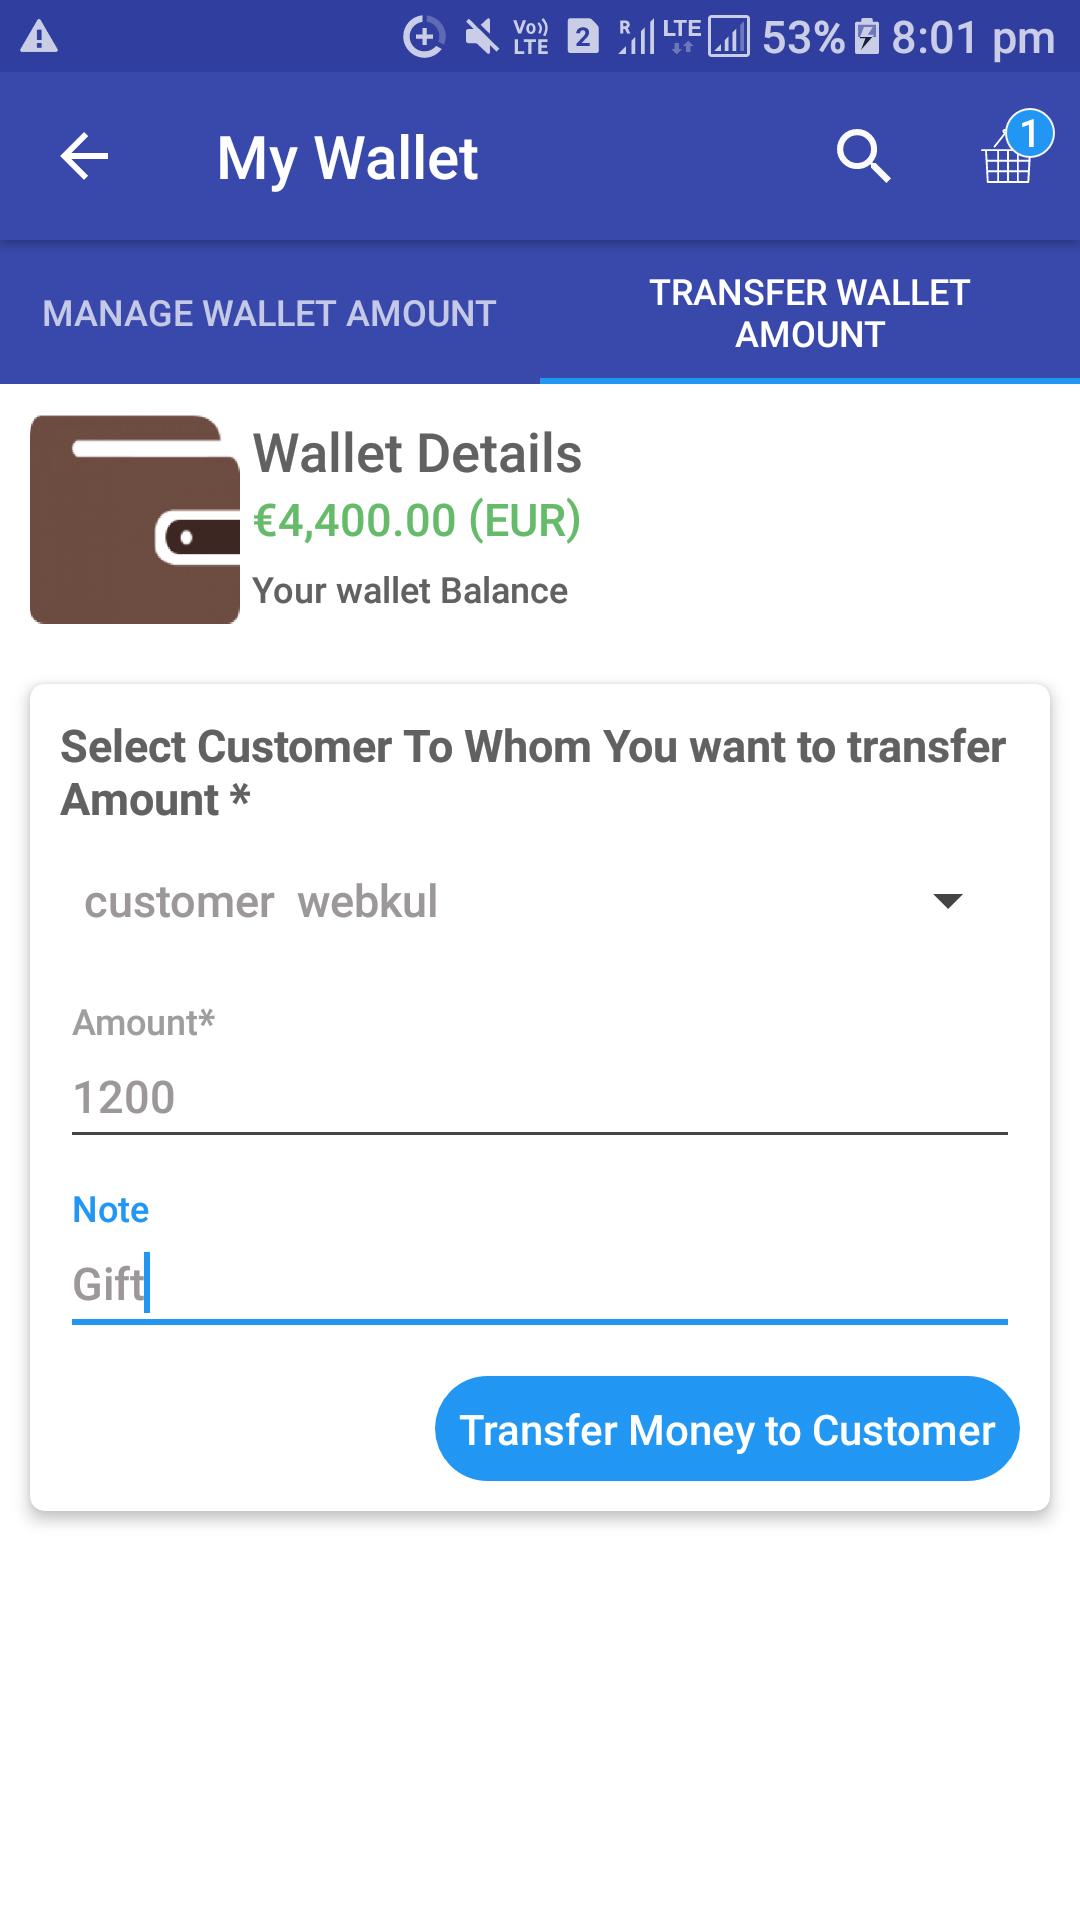 Opencart Mobikul Wallet - Transfer Amout to Customer Wallet